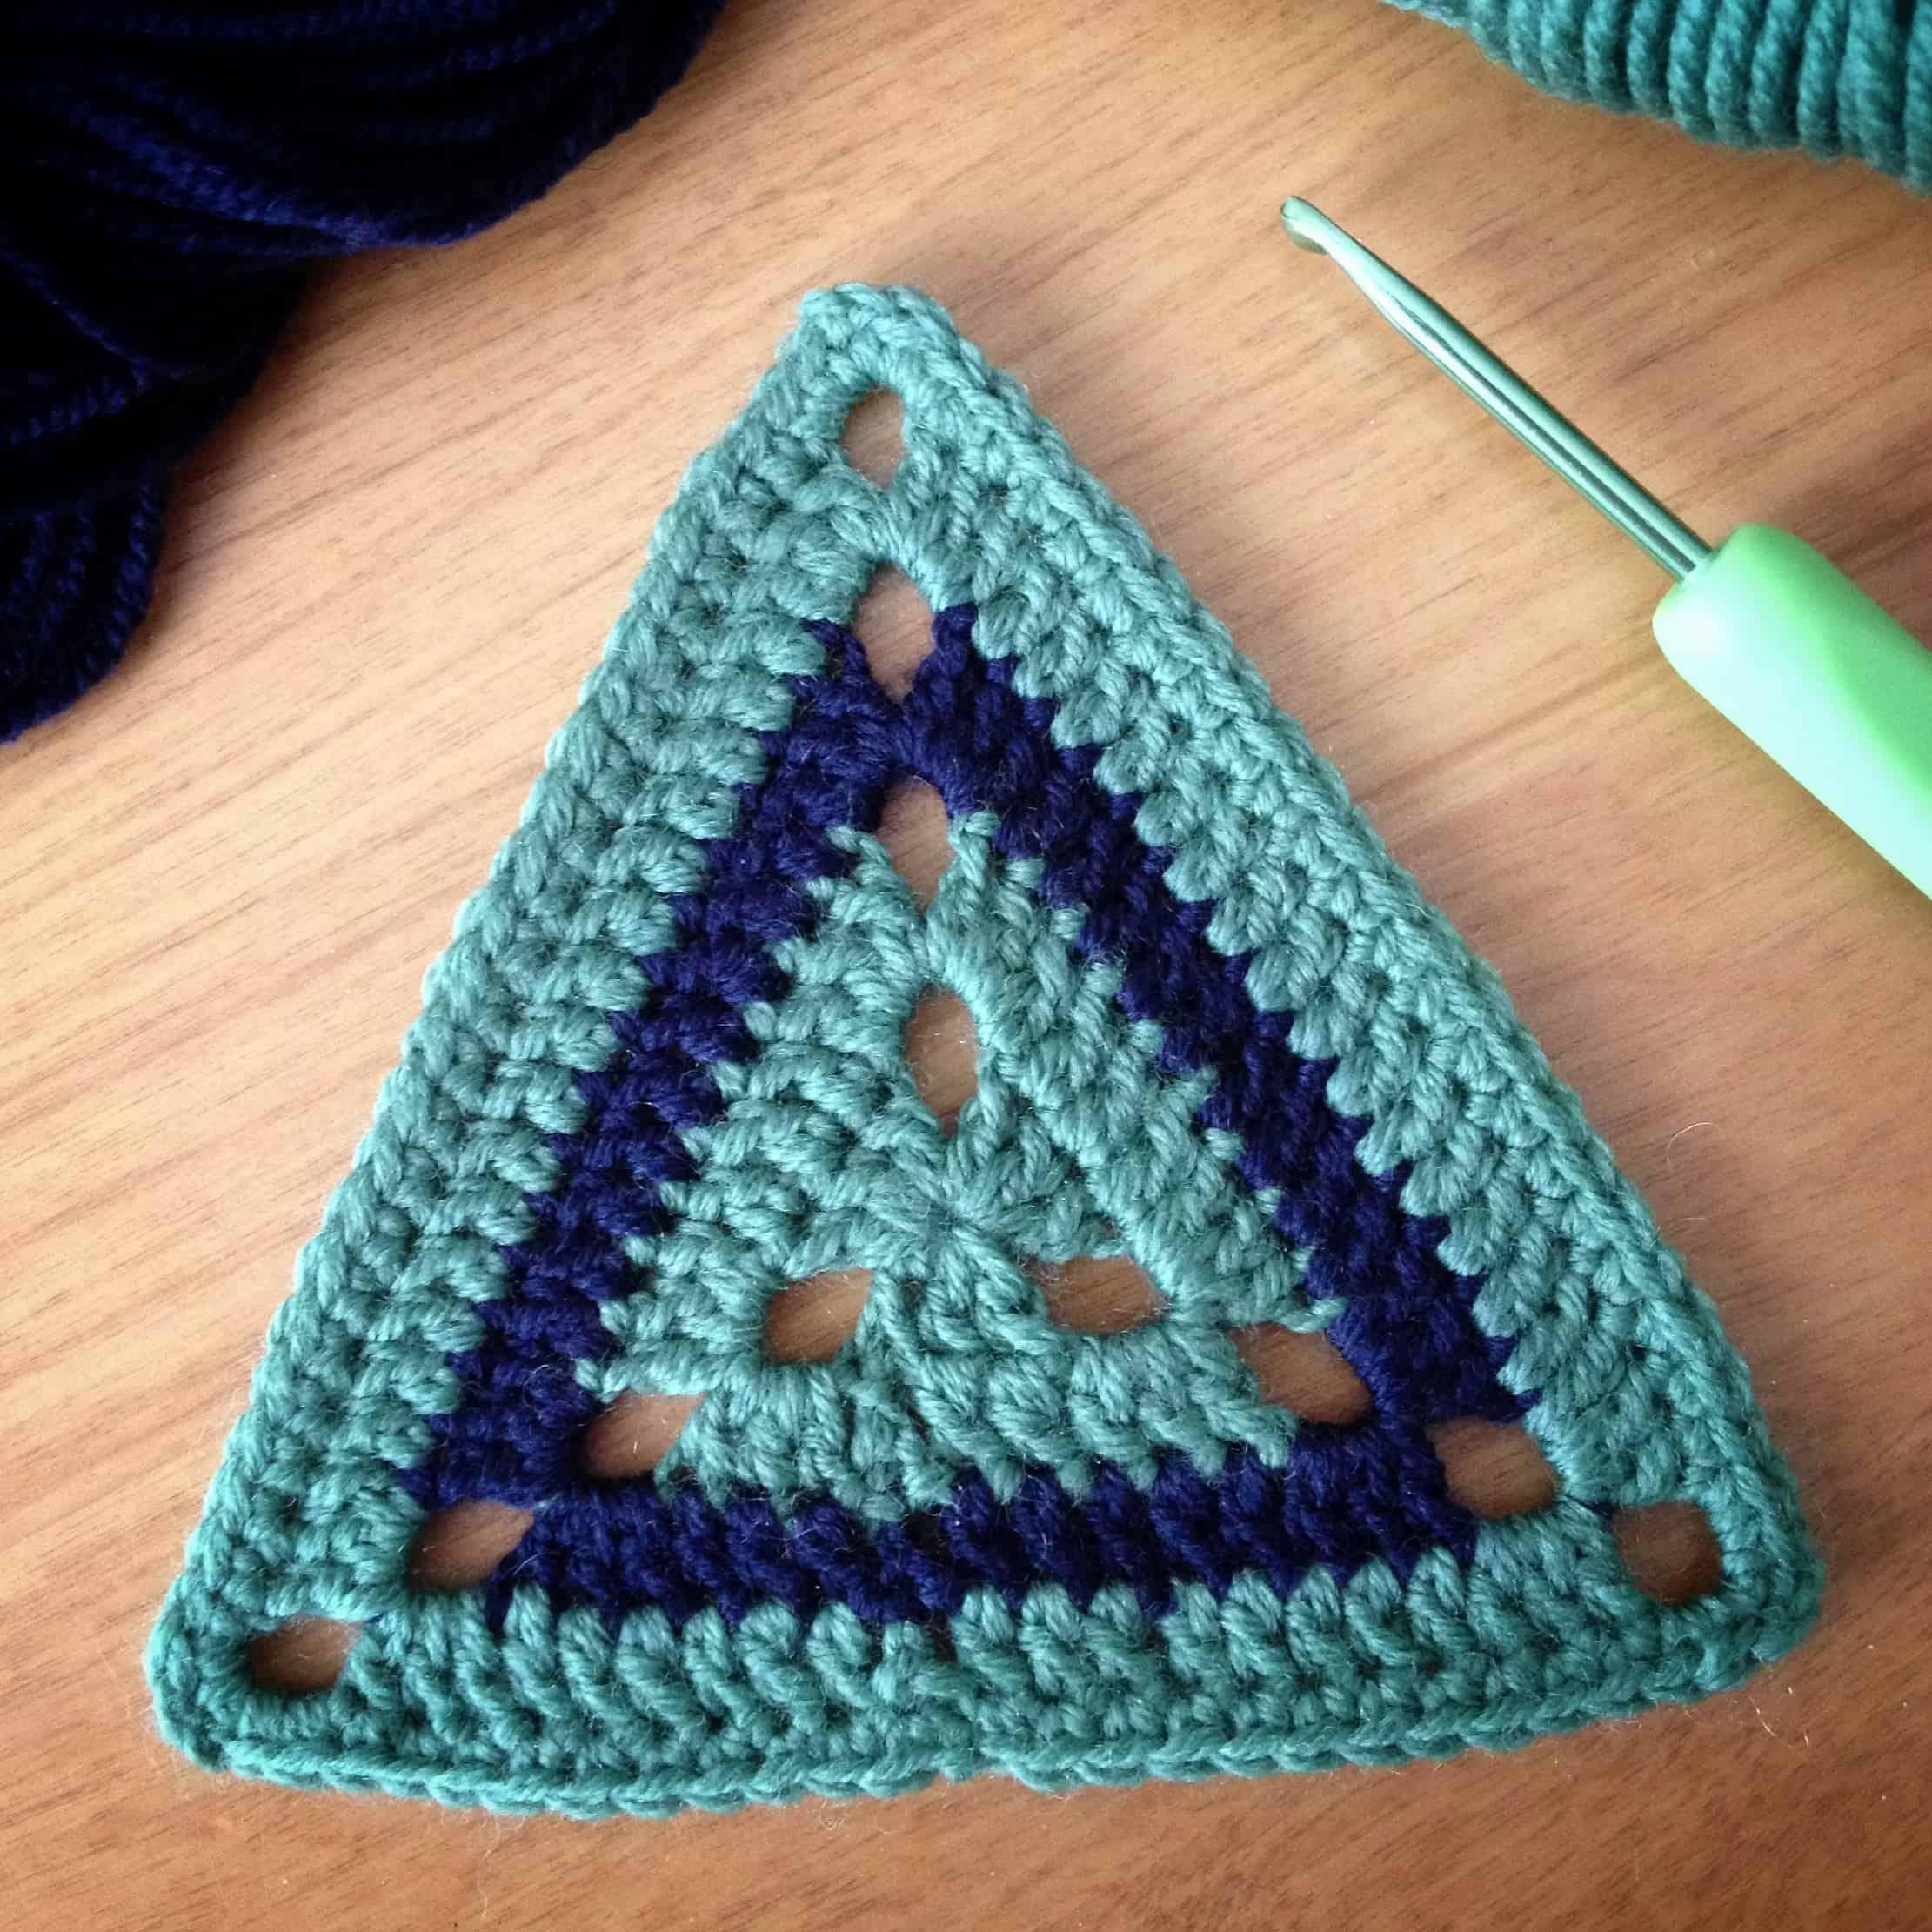 crochet square motif diagram pattern gm stereo wiring triangular